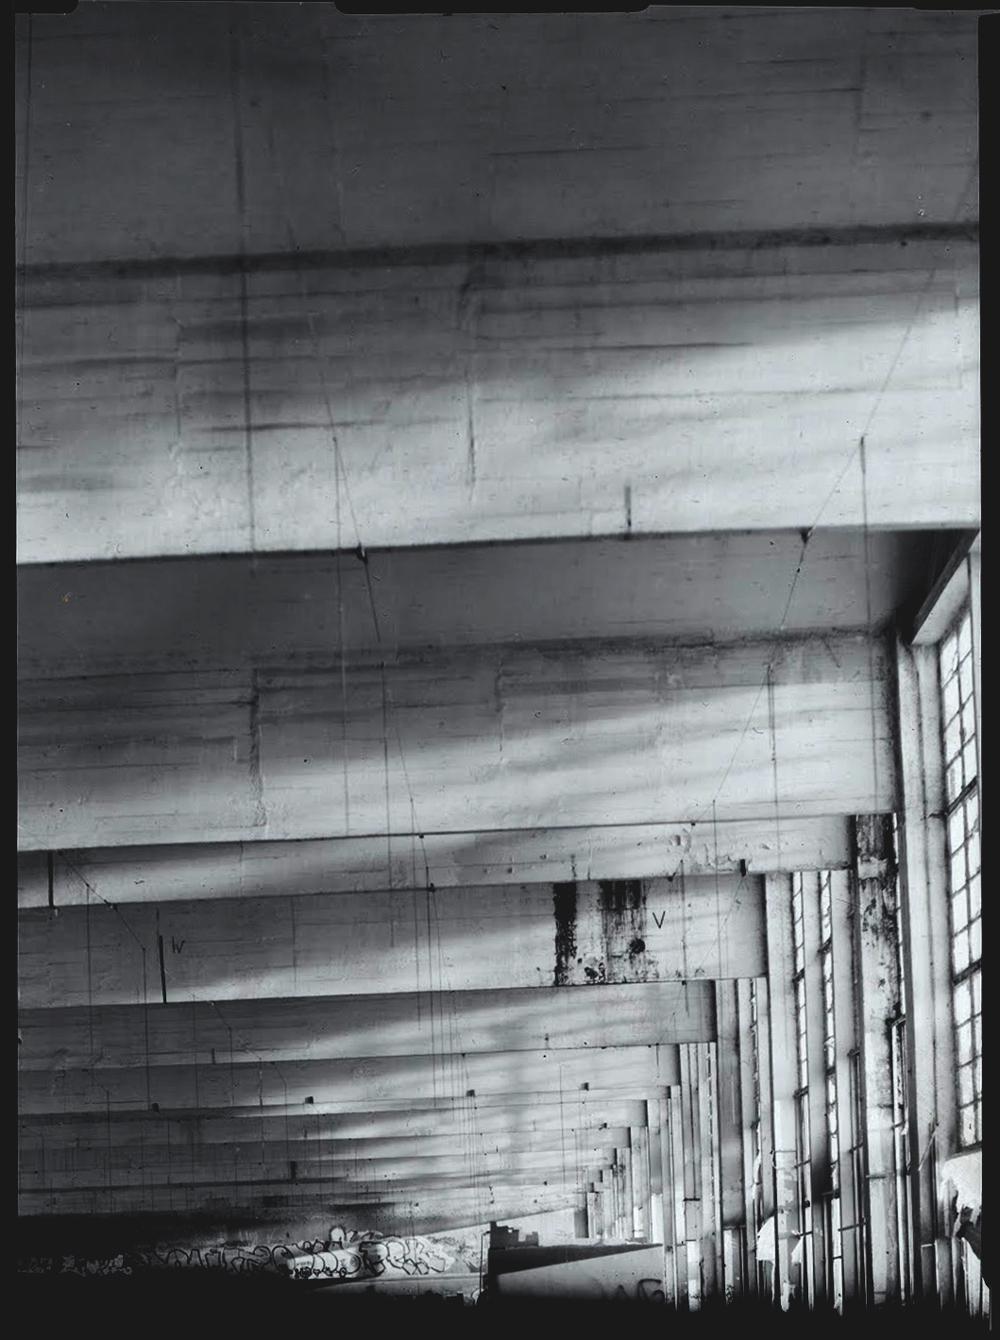 Architecture of photography - Dévai Zoltán, Juhász Norbert 10.jpg